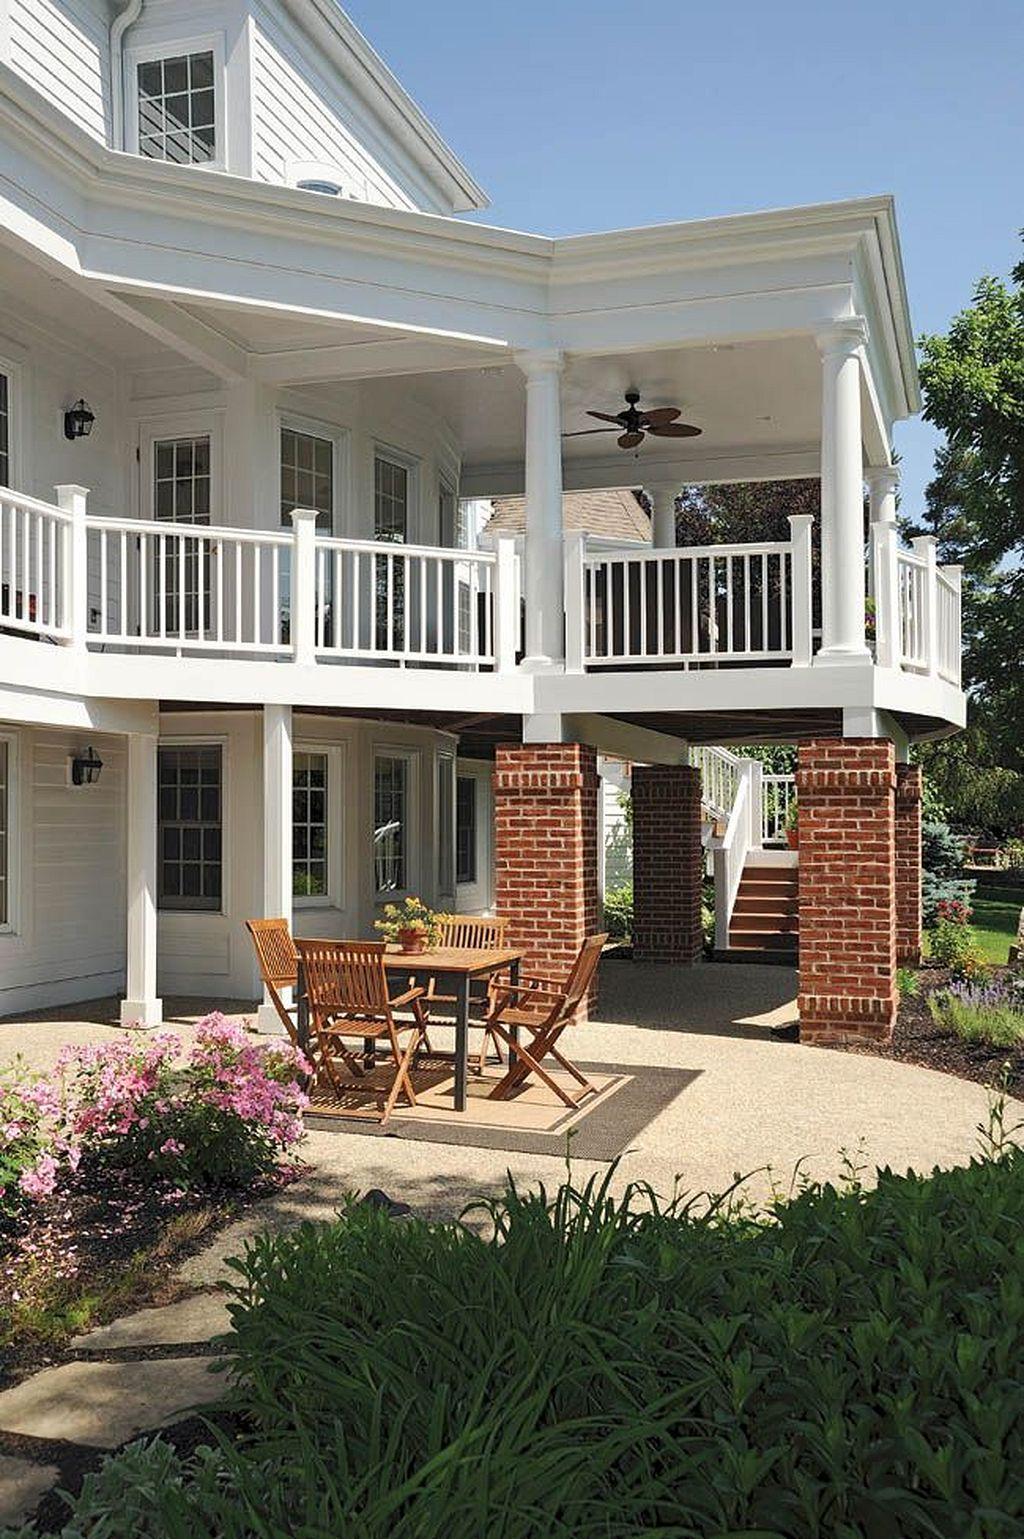 40 Second Floor Deck Ideas To Add